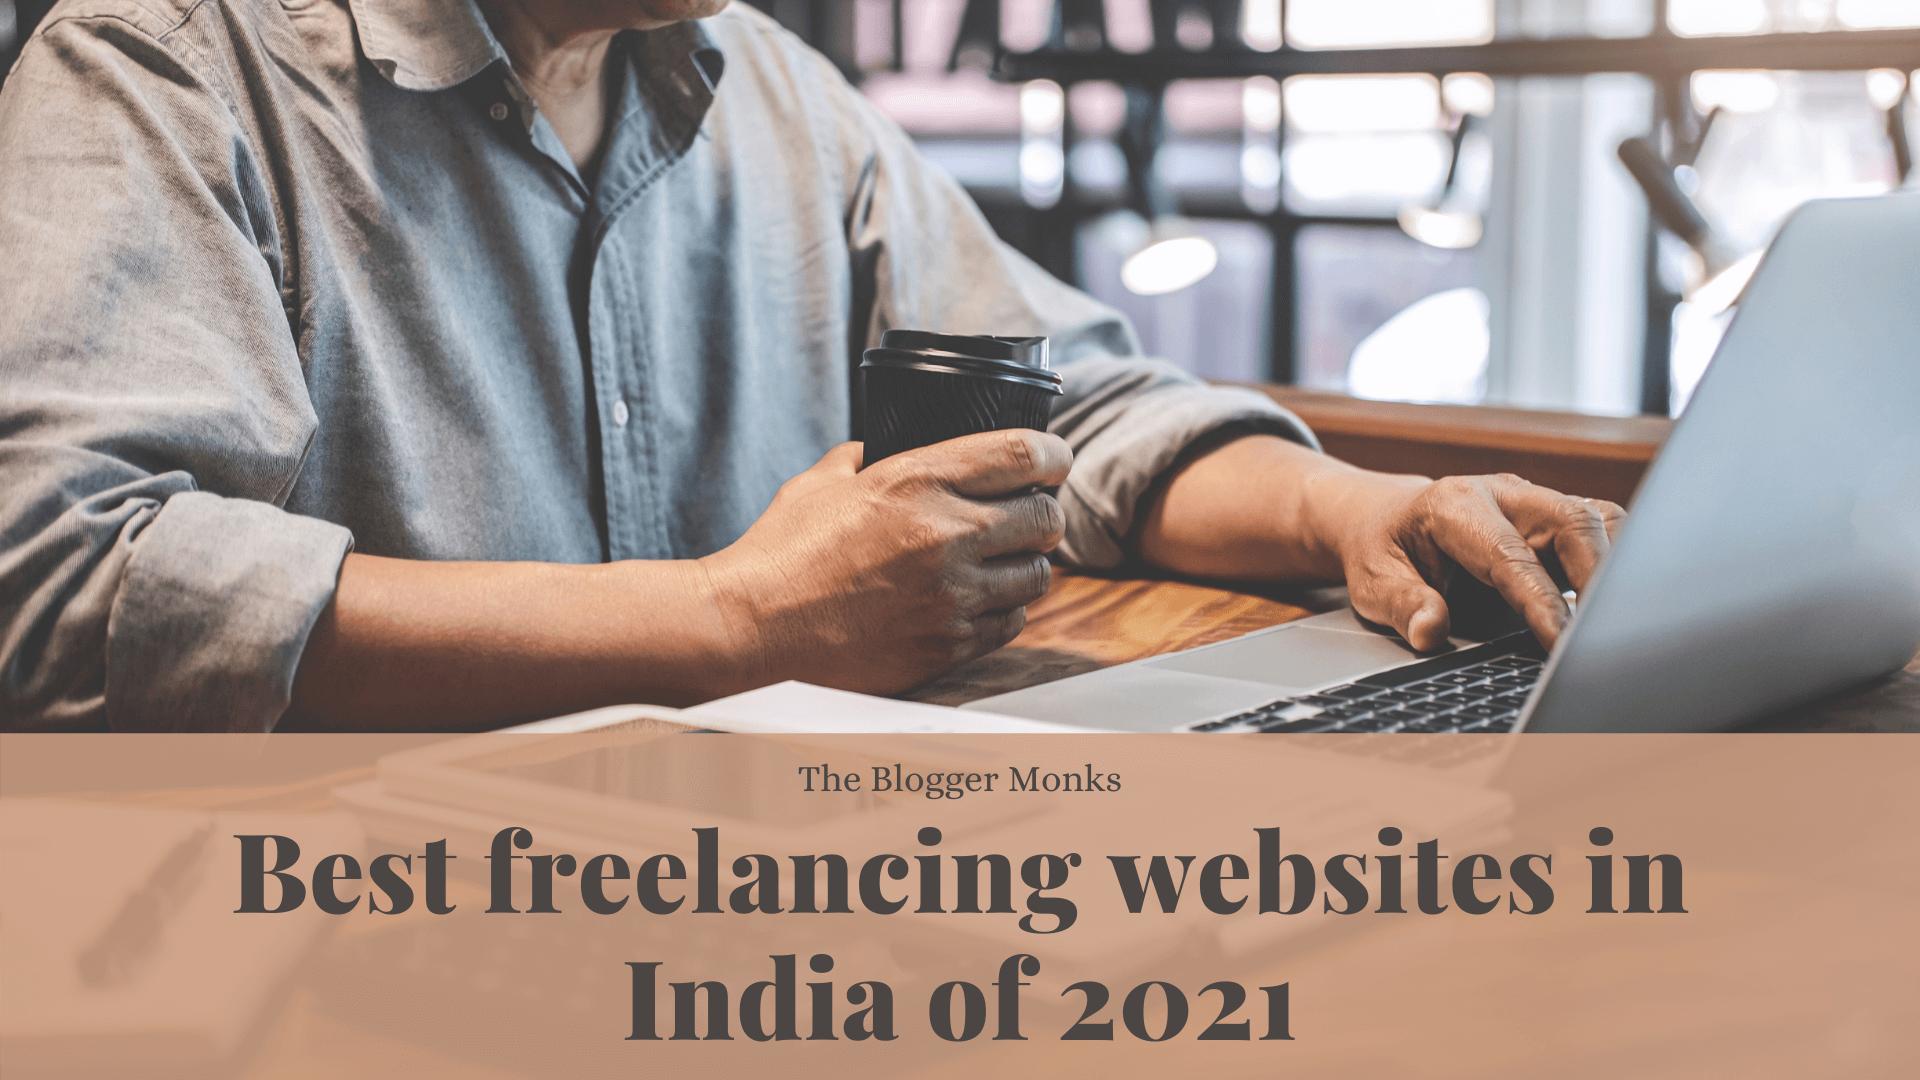 Best freelancing websites in India of 2021